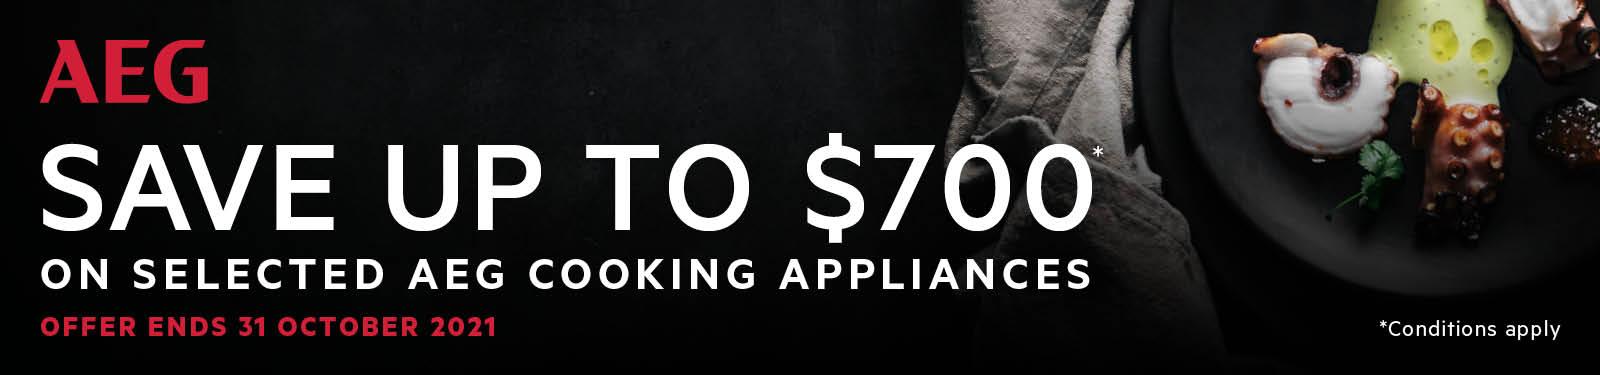 jpg-spartana-dig-save700-cooking-1600x375-oct21.jpg